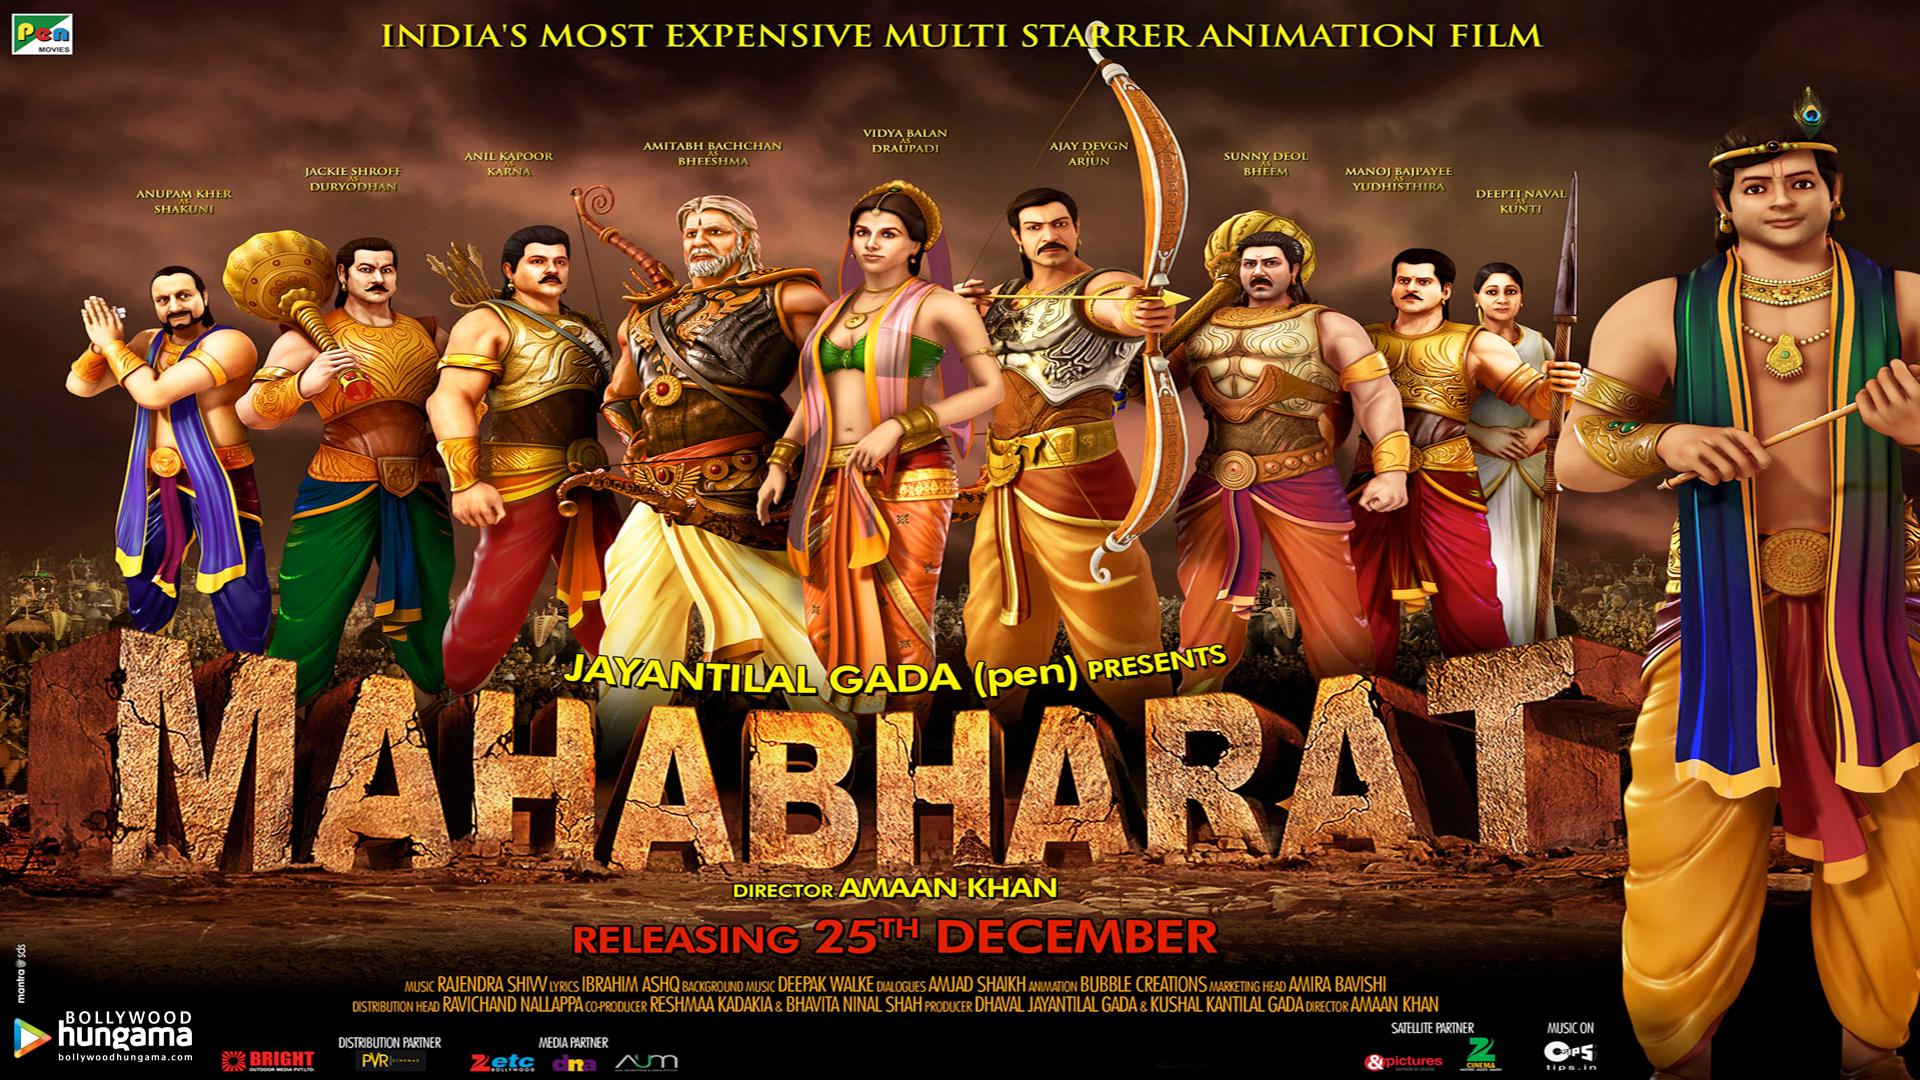 Mahabharat 2013 3D Animated Movie Wiki